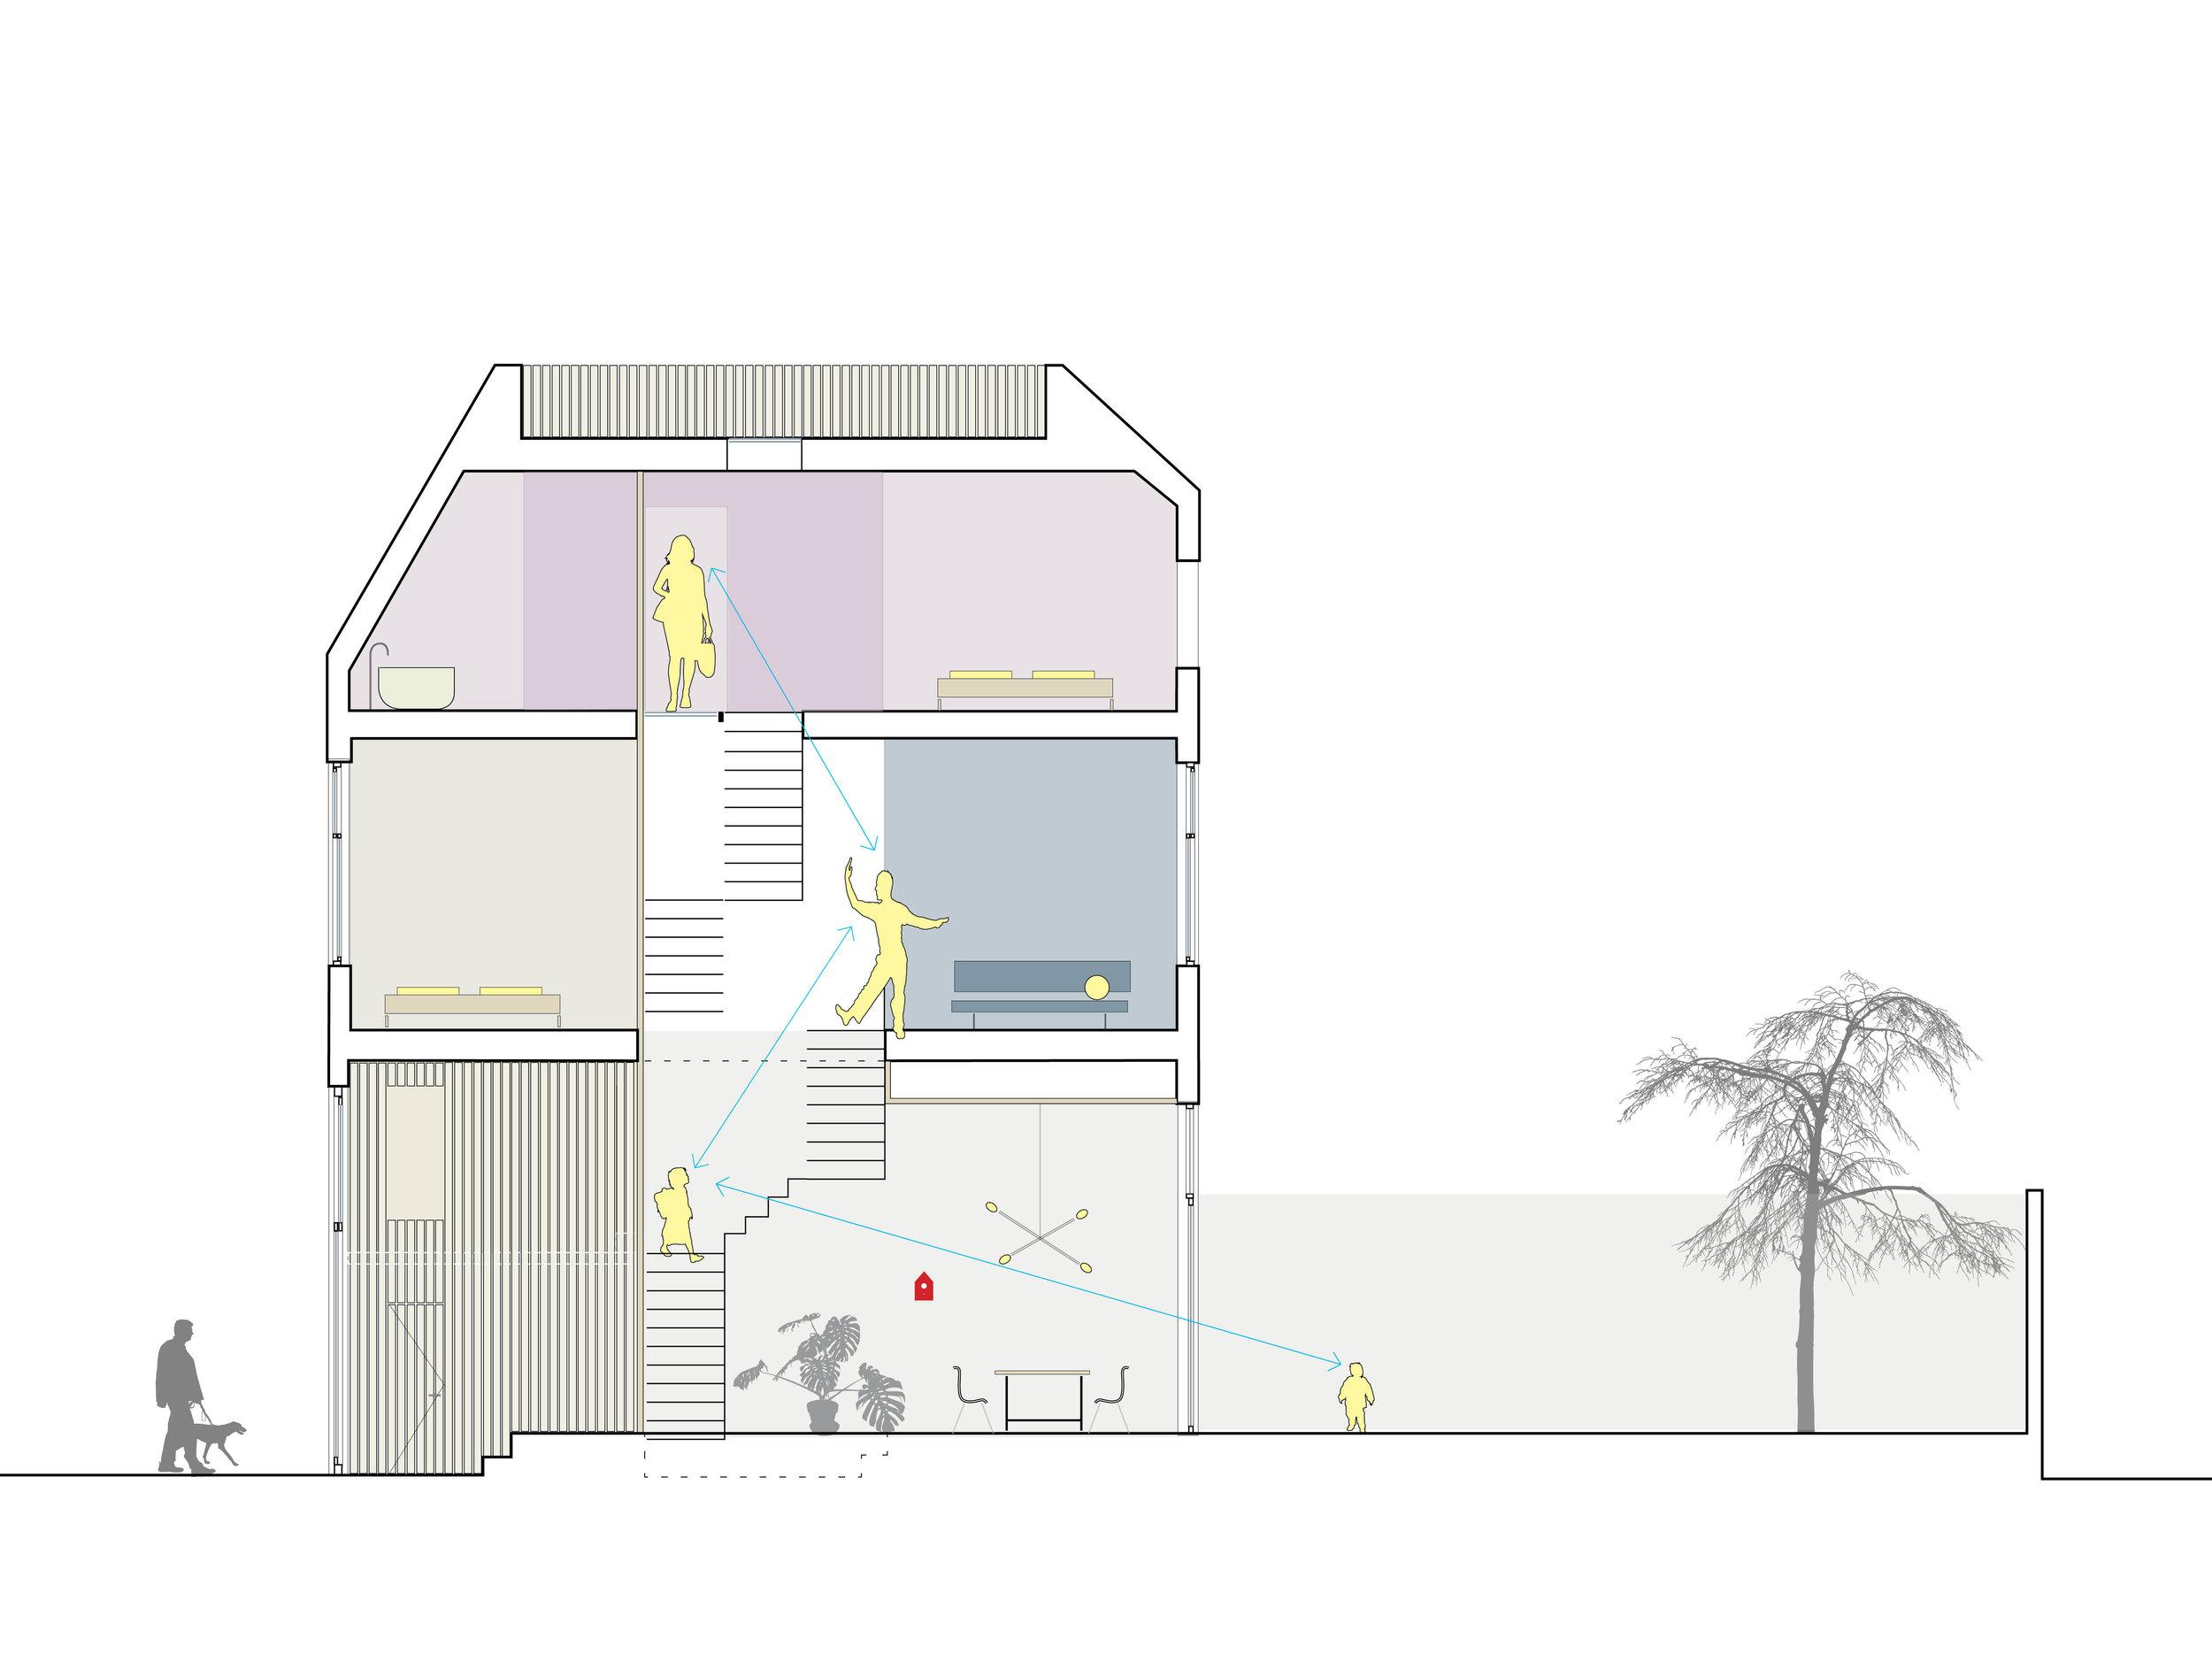 Personal-Architecture-the hague-laura en matteo-2.jpg